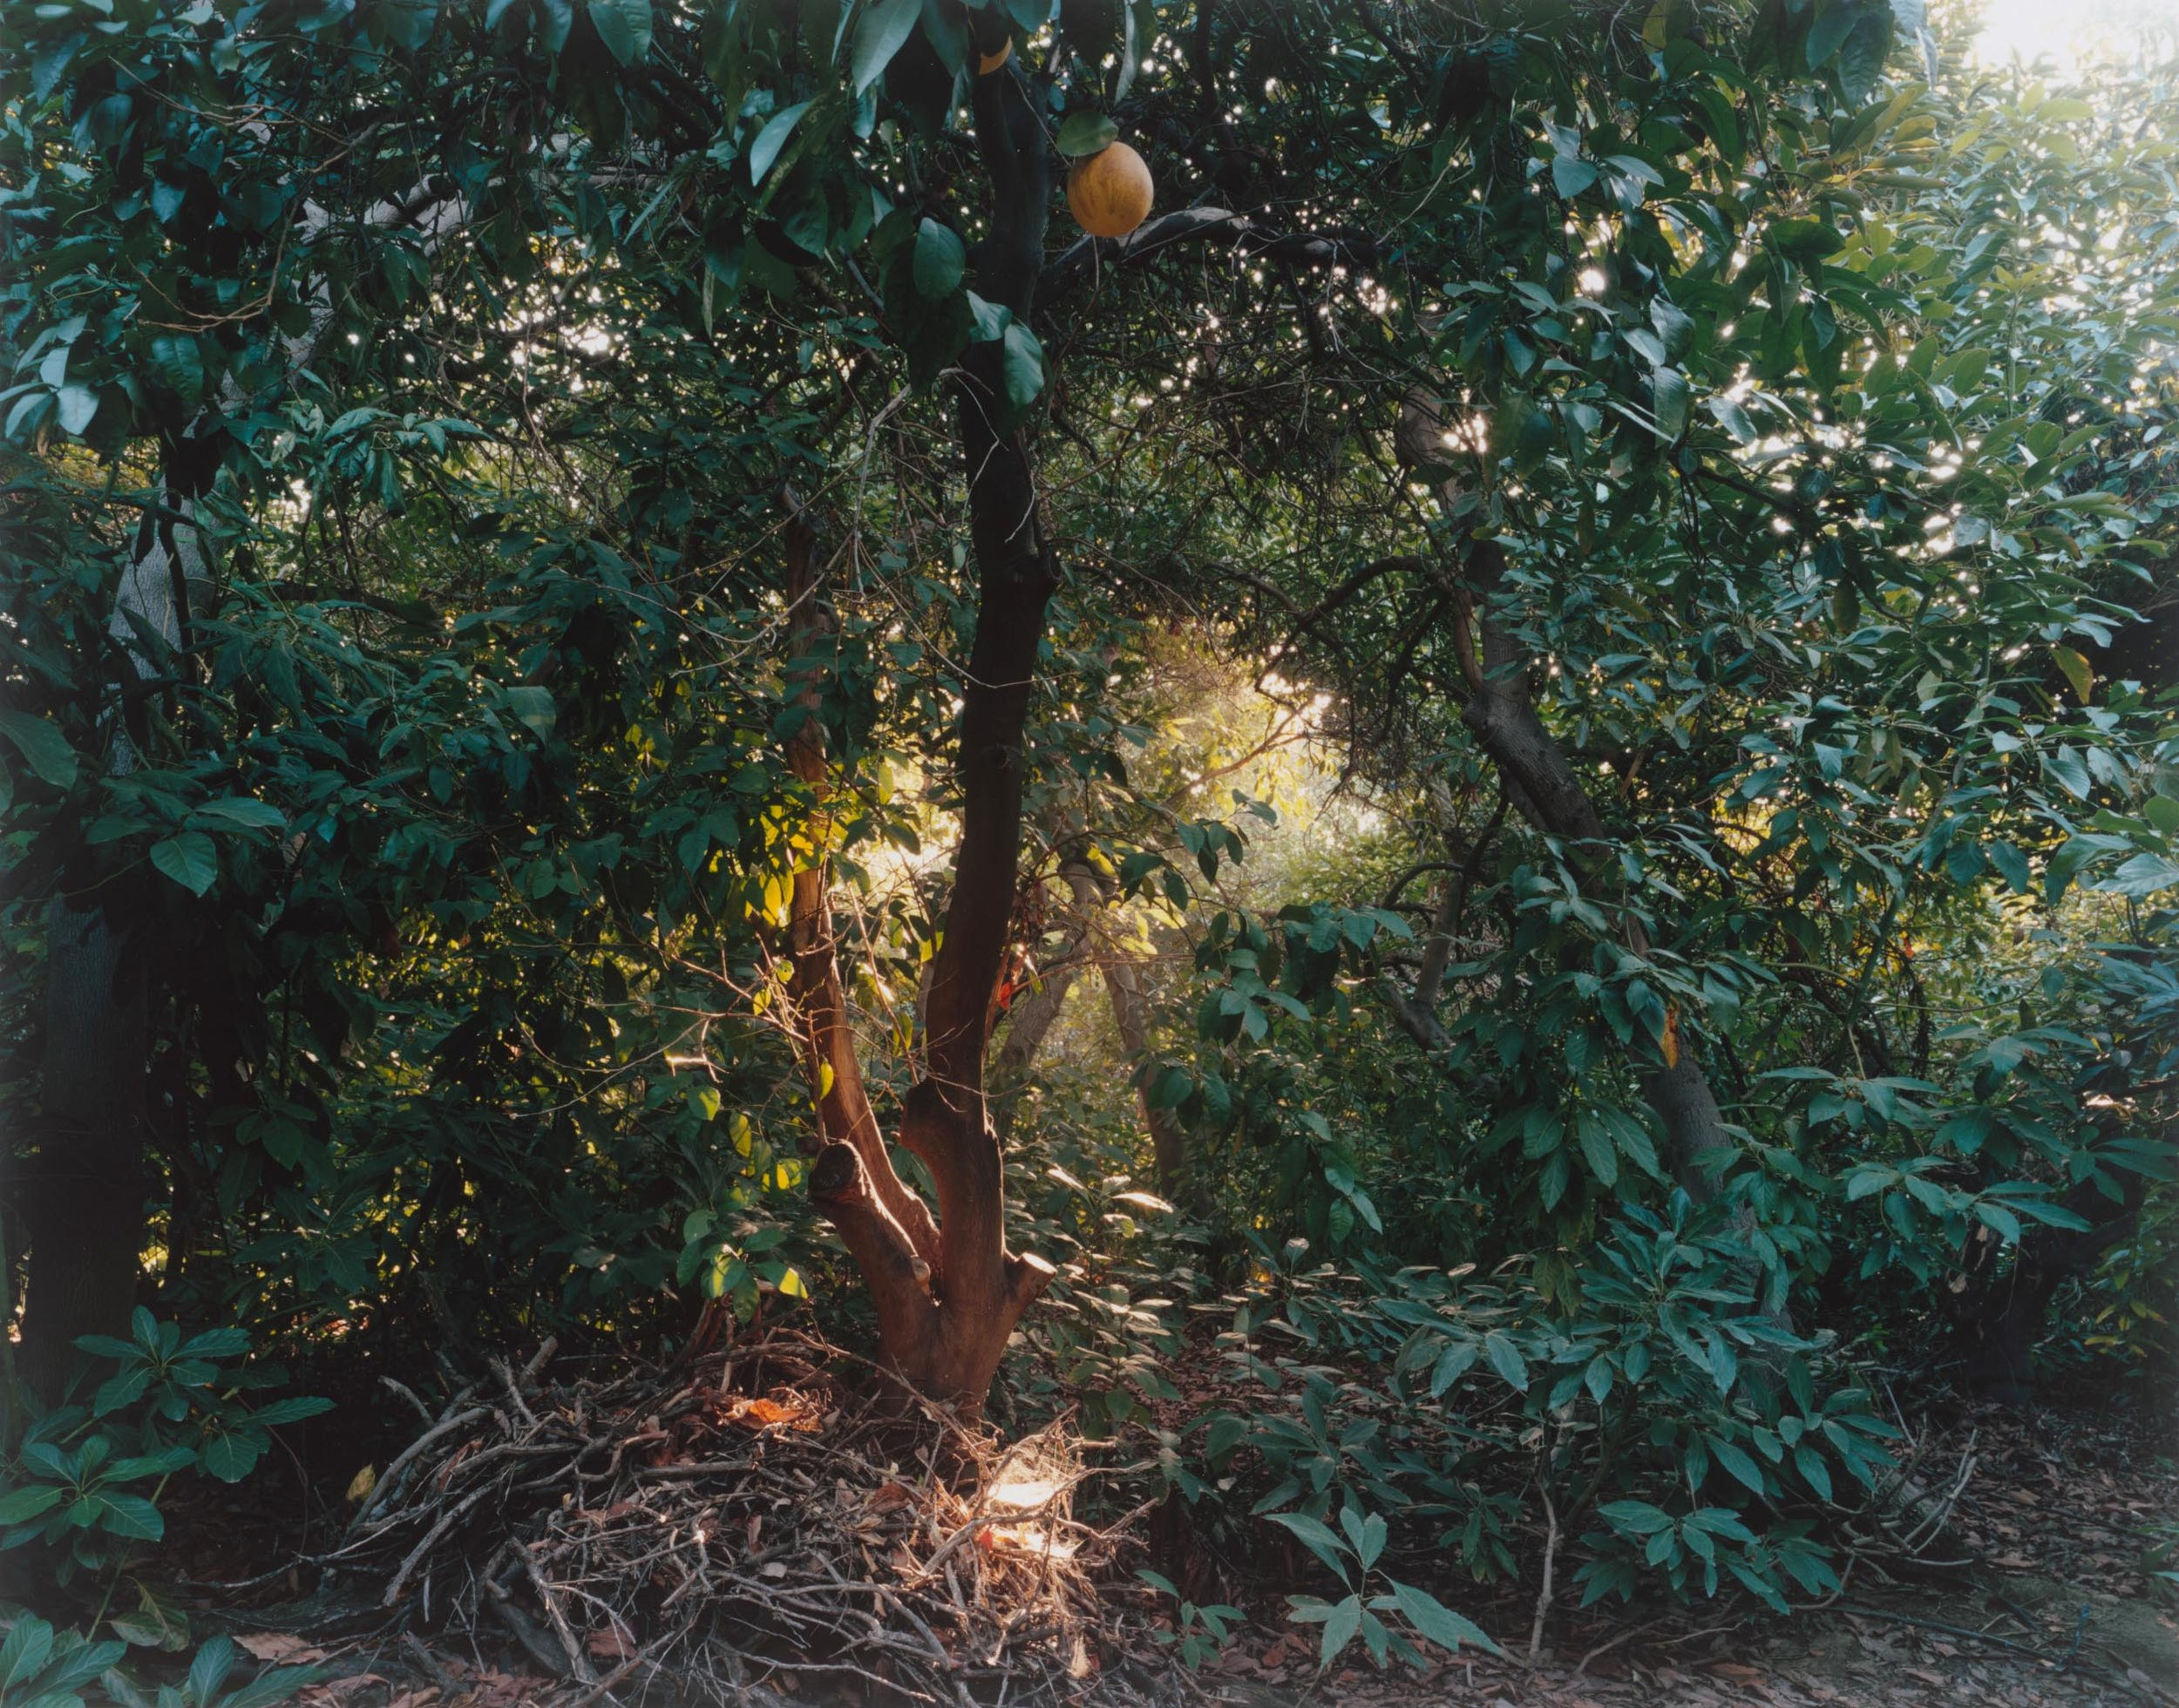 Simone Nieweg Grapefruit, Spinnweben und Reisighaufen, Grand Terrace, CA 2014.jpg